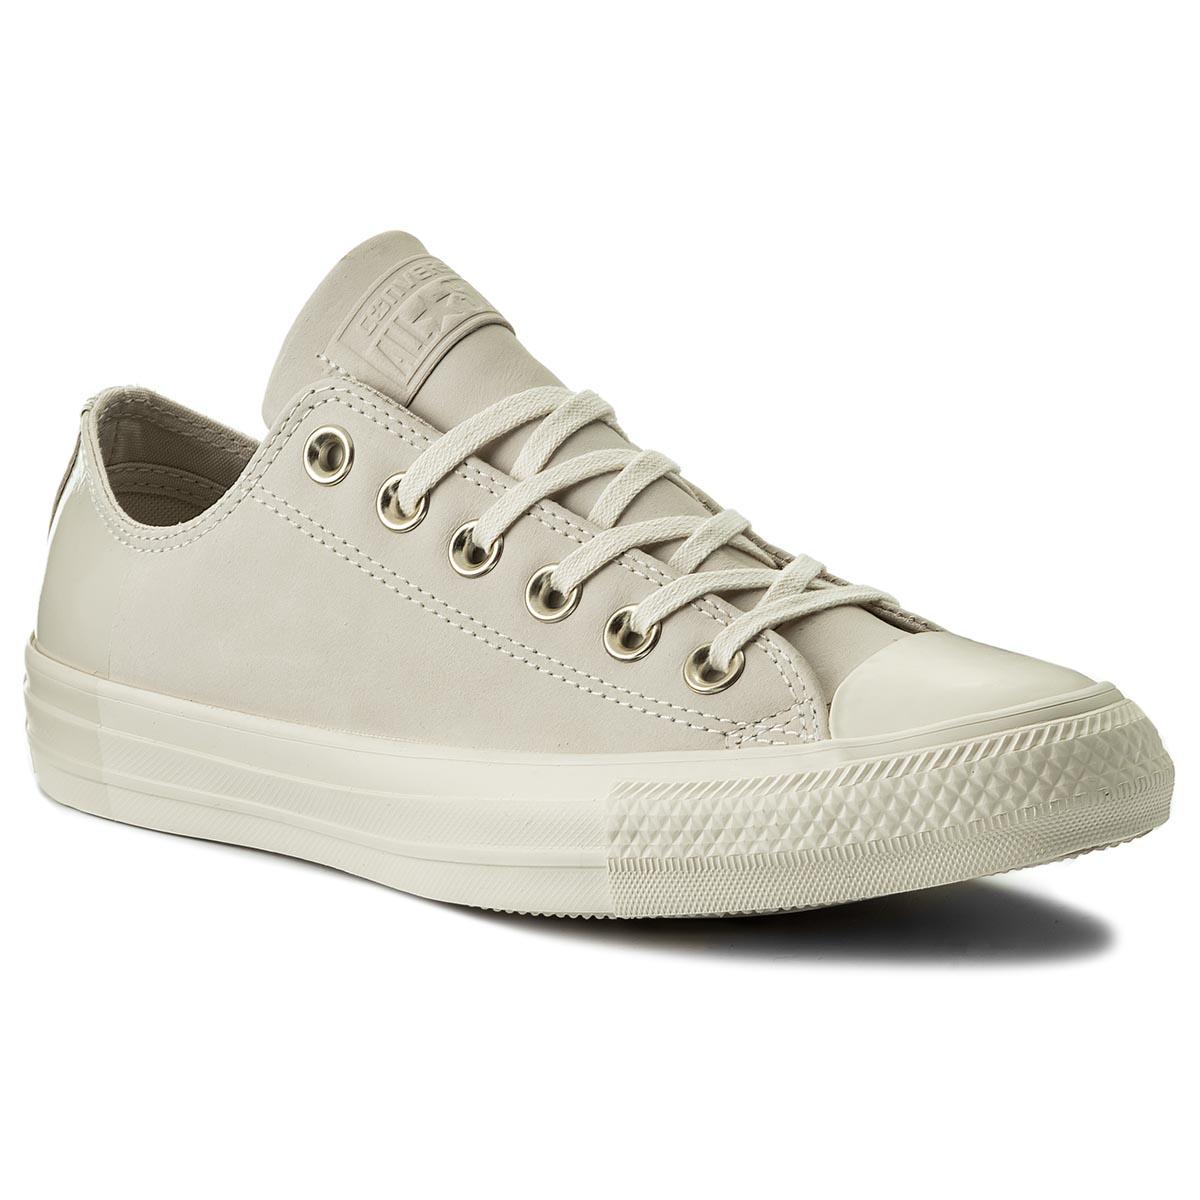 f9875fb8537f Sneakers CONVERSE - Ctas 70 Ox 159625C Light Carbon Egret - Sneakers ...